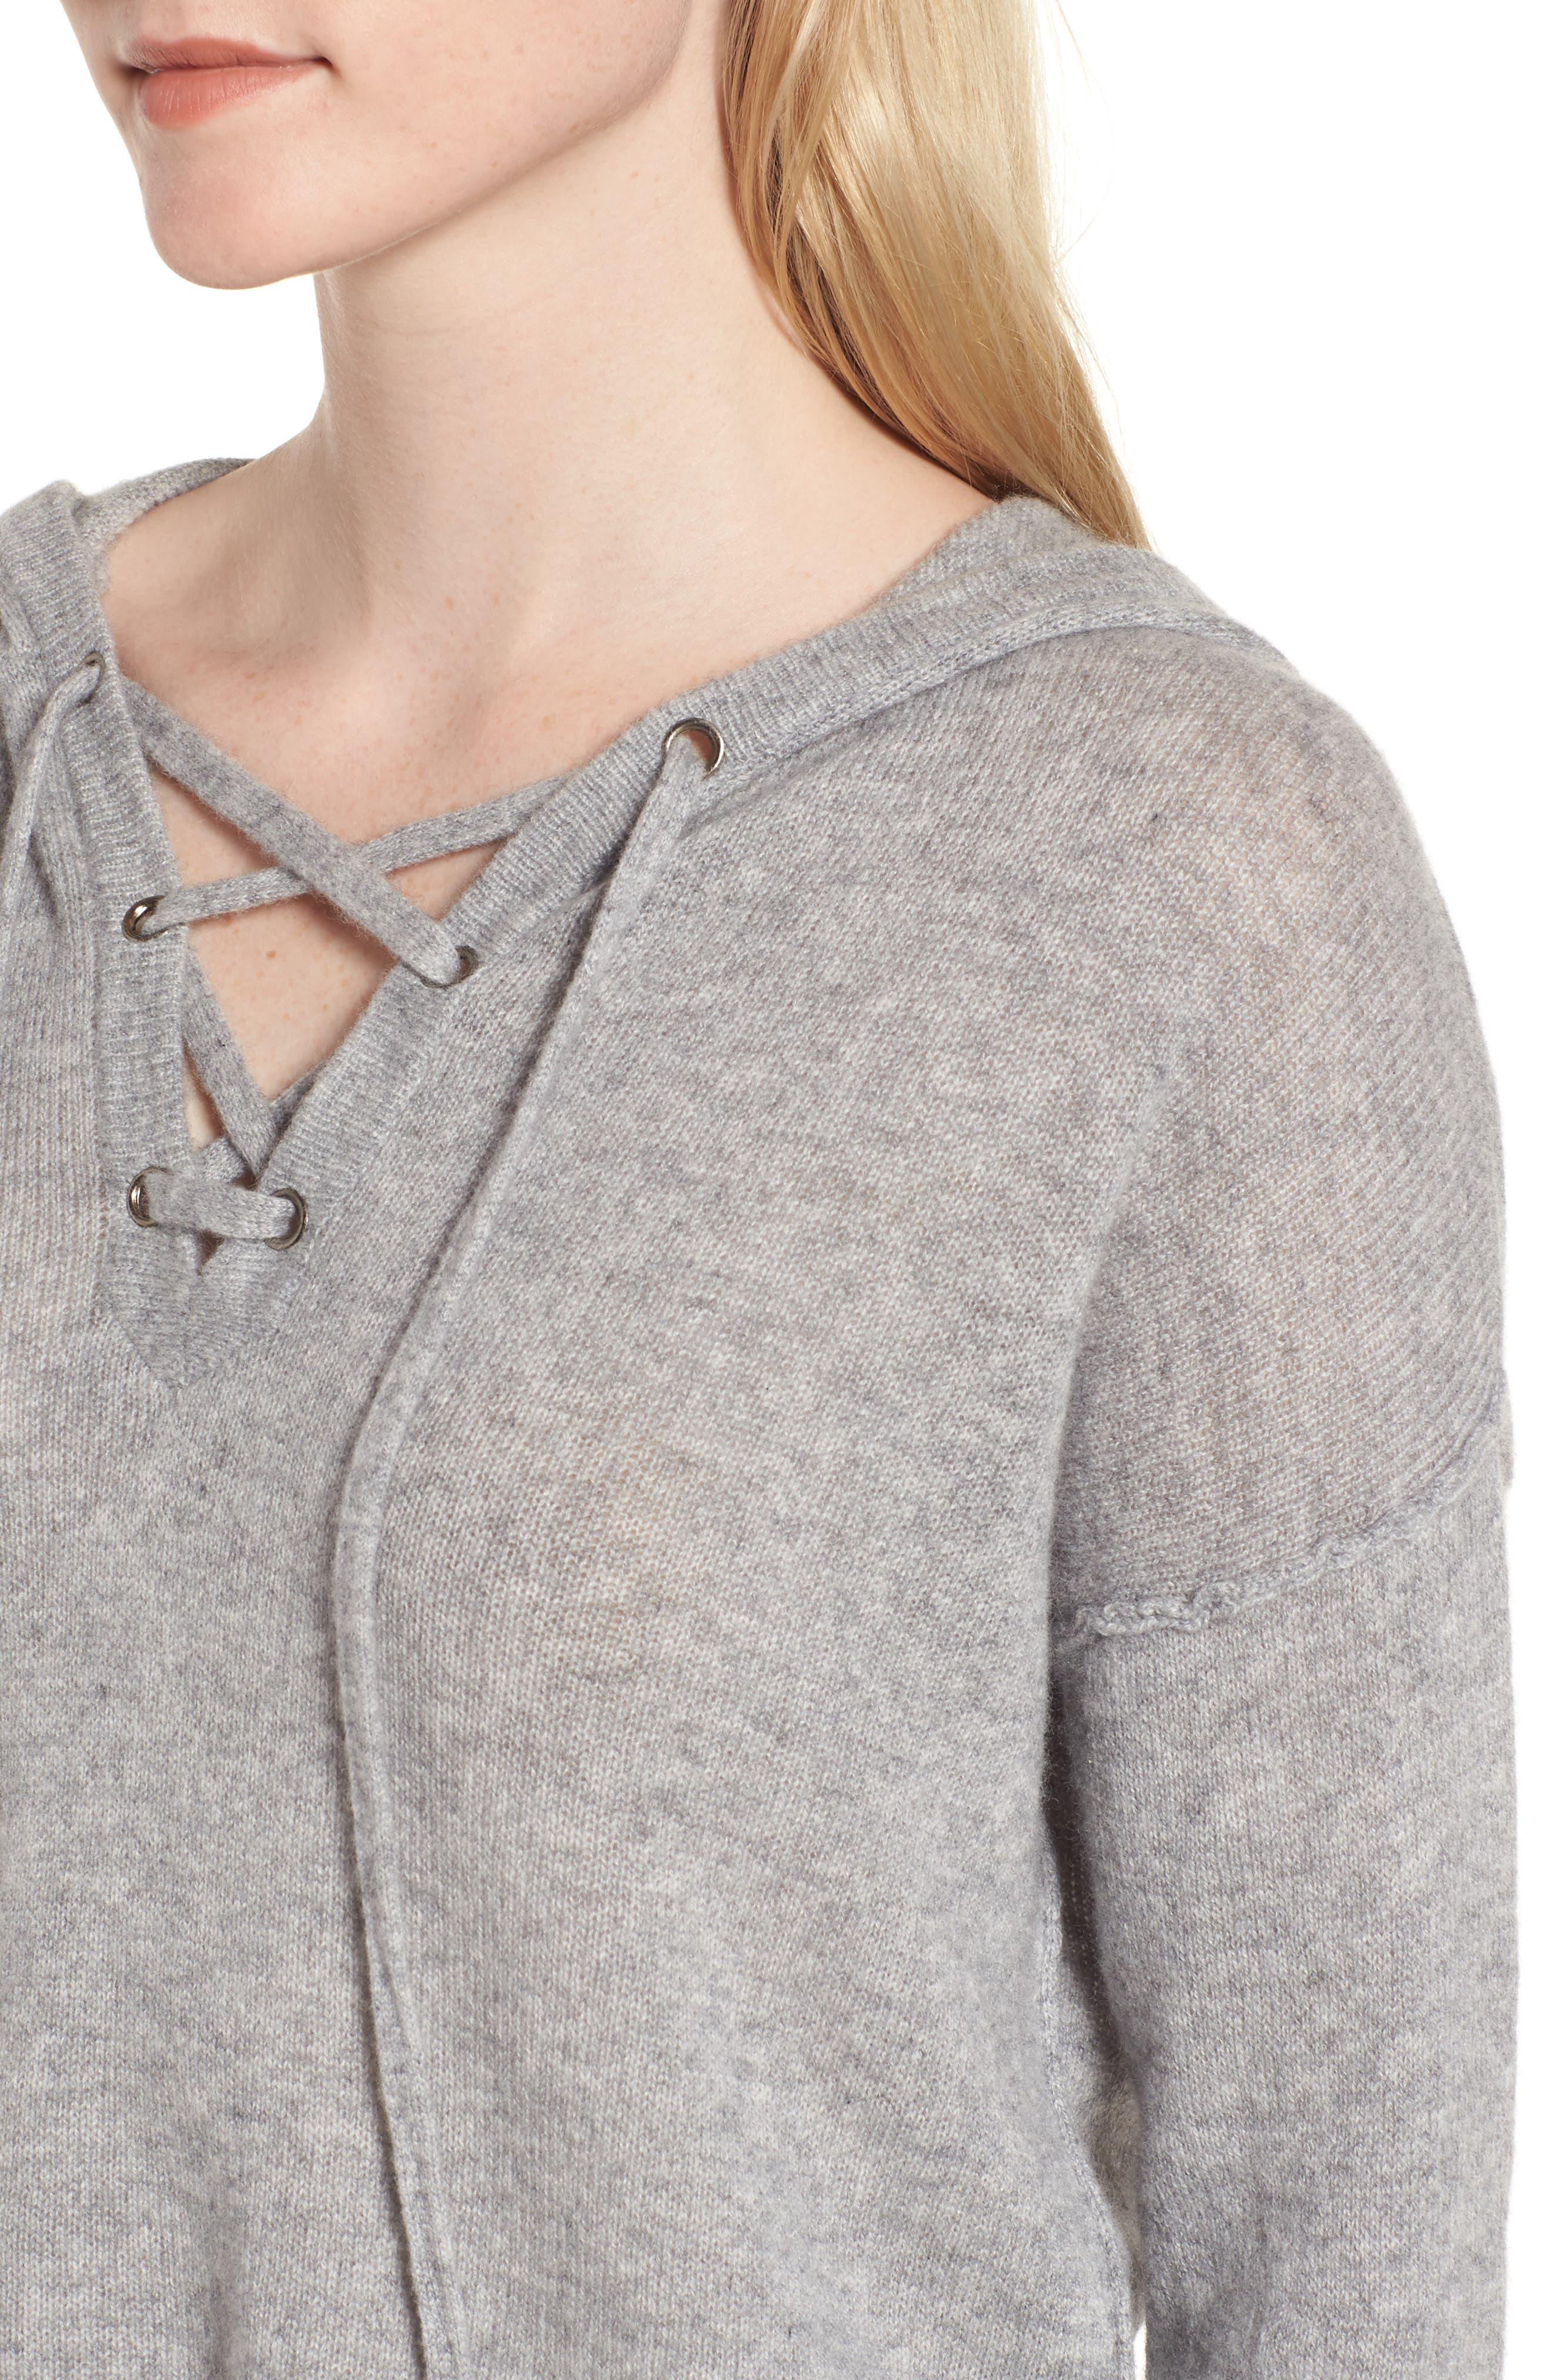 Dakota Cashmere Hooded Sweater,                             Alternate thumbnail 4, color,                             052